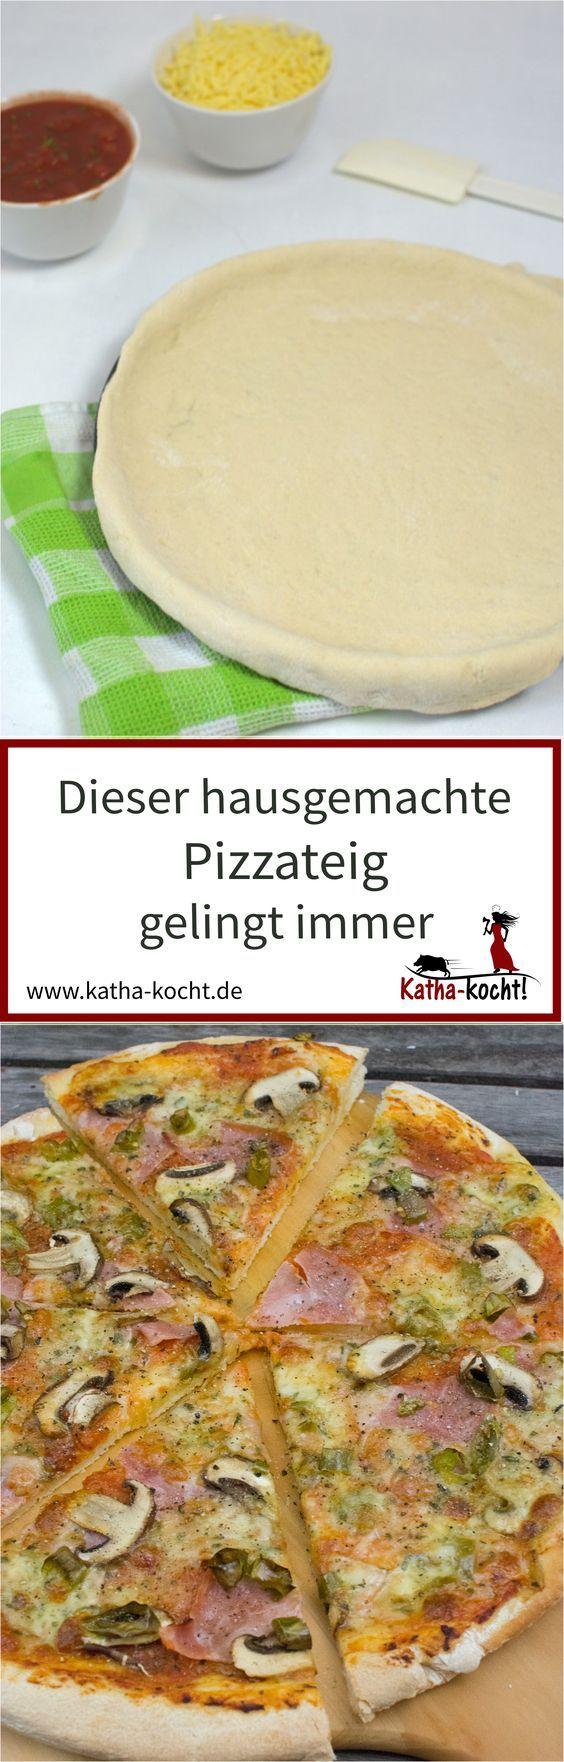 pizzateig rezepte pinterest pizza teig teig und pizza. Black Bedroom Furniture Sets. Home Design Ideas